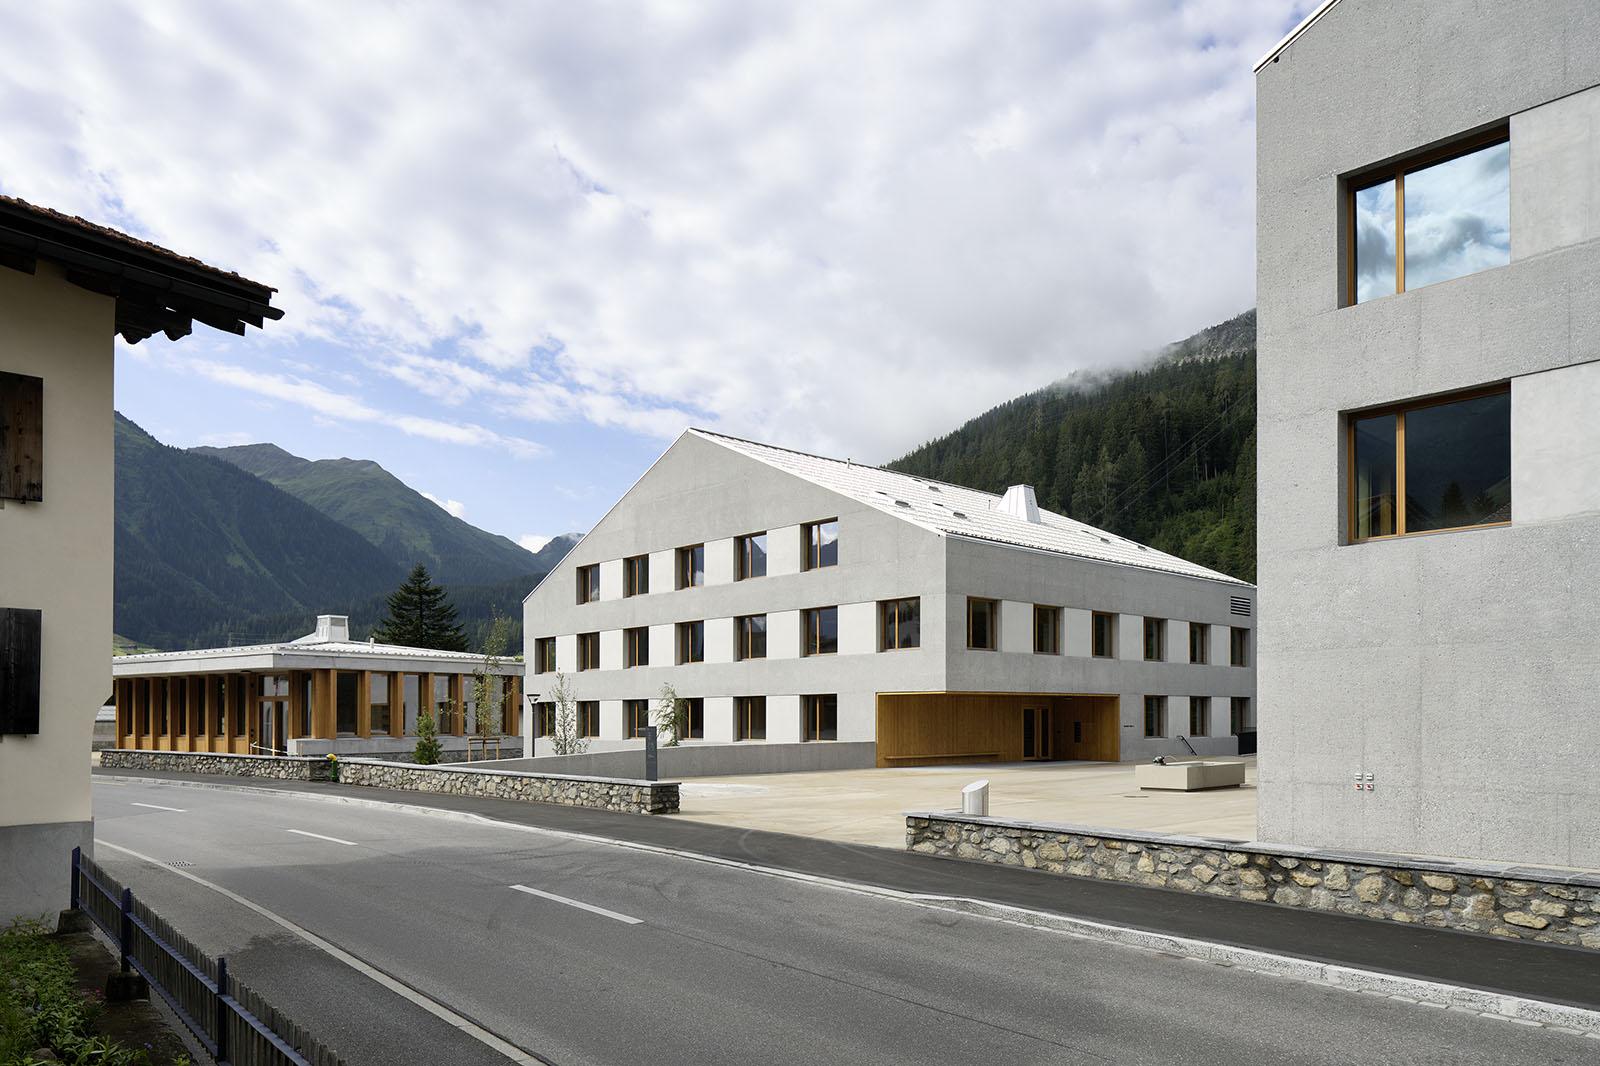 schulhaus-klosters-003